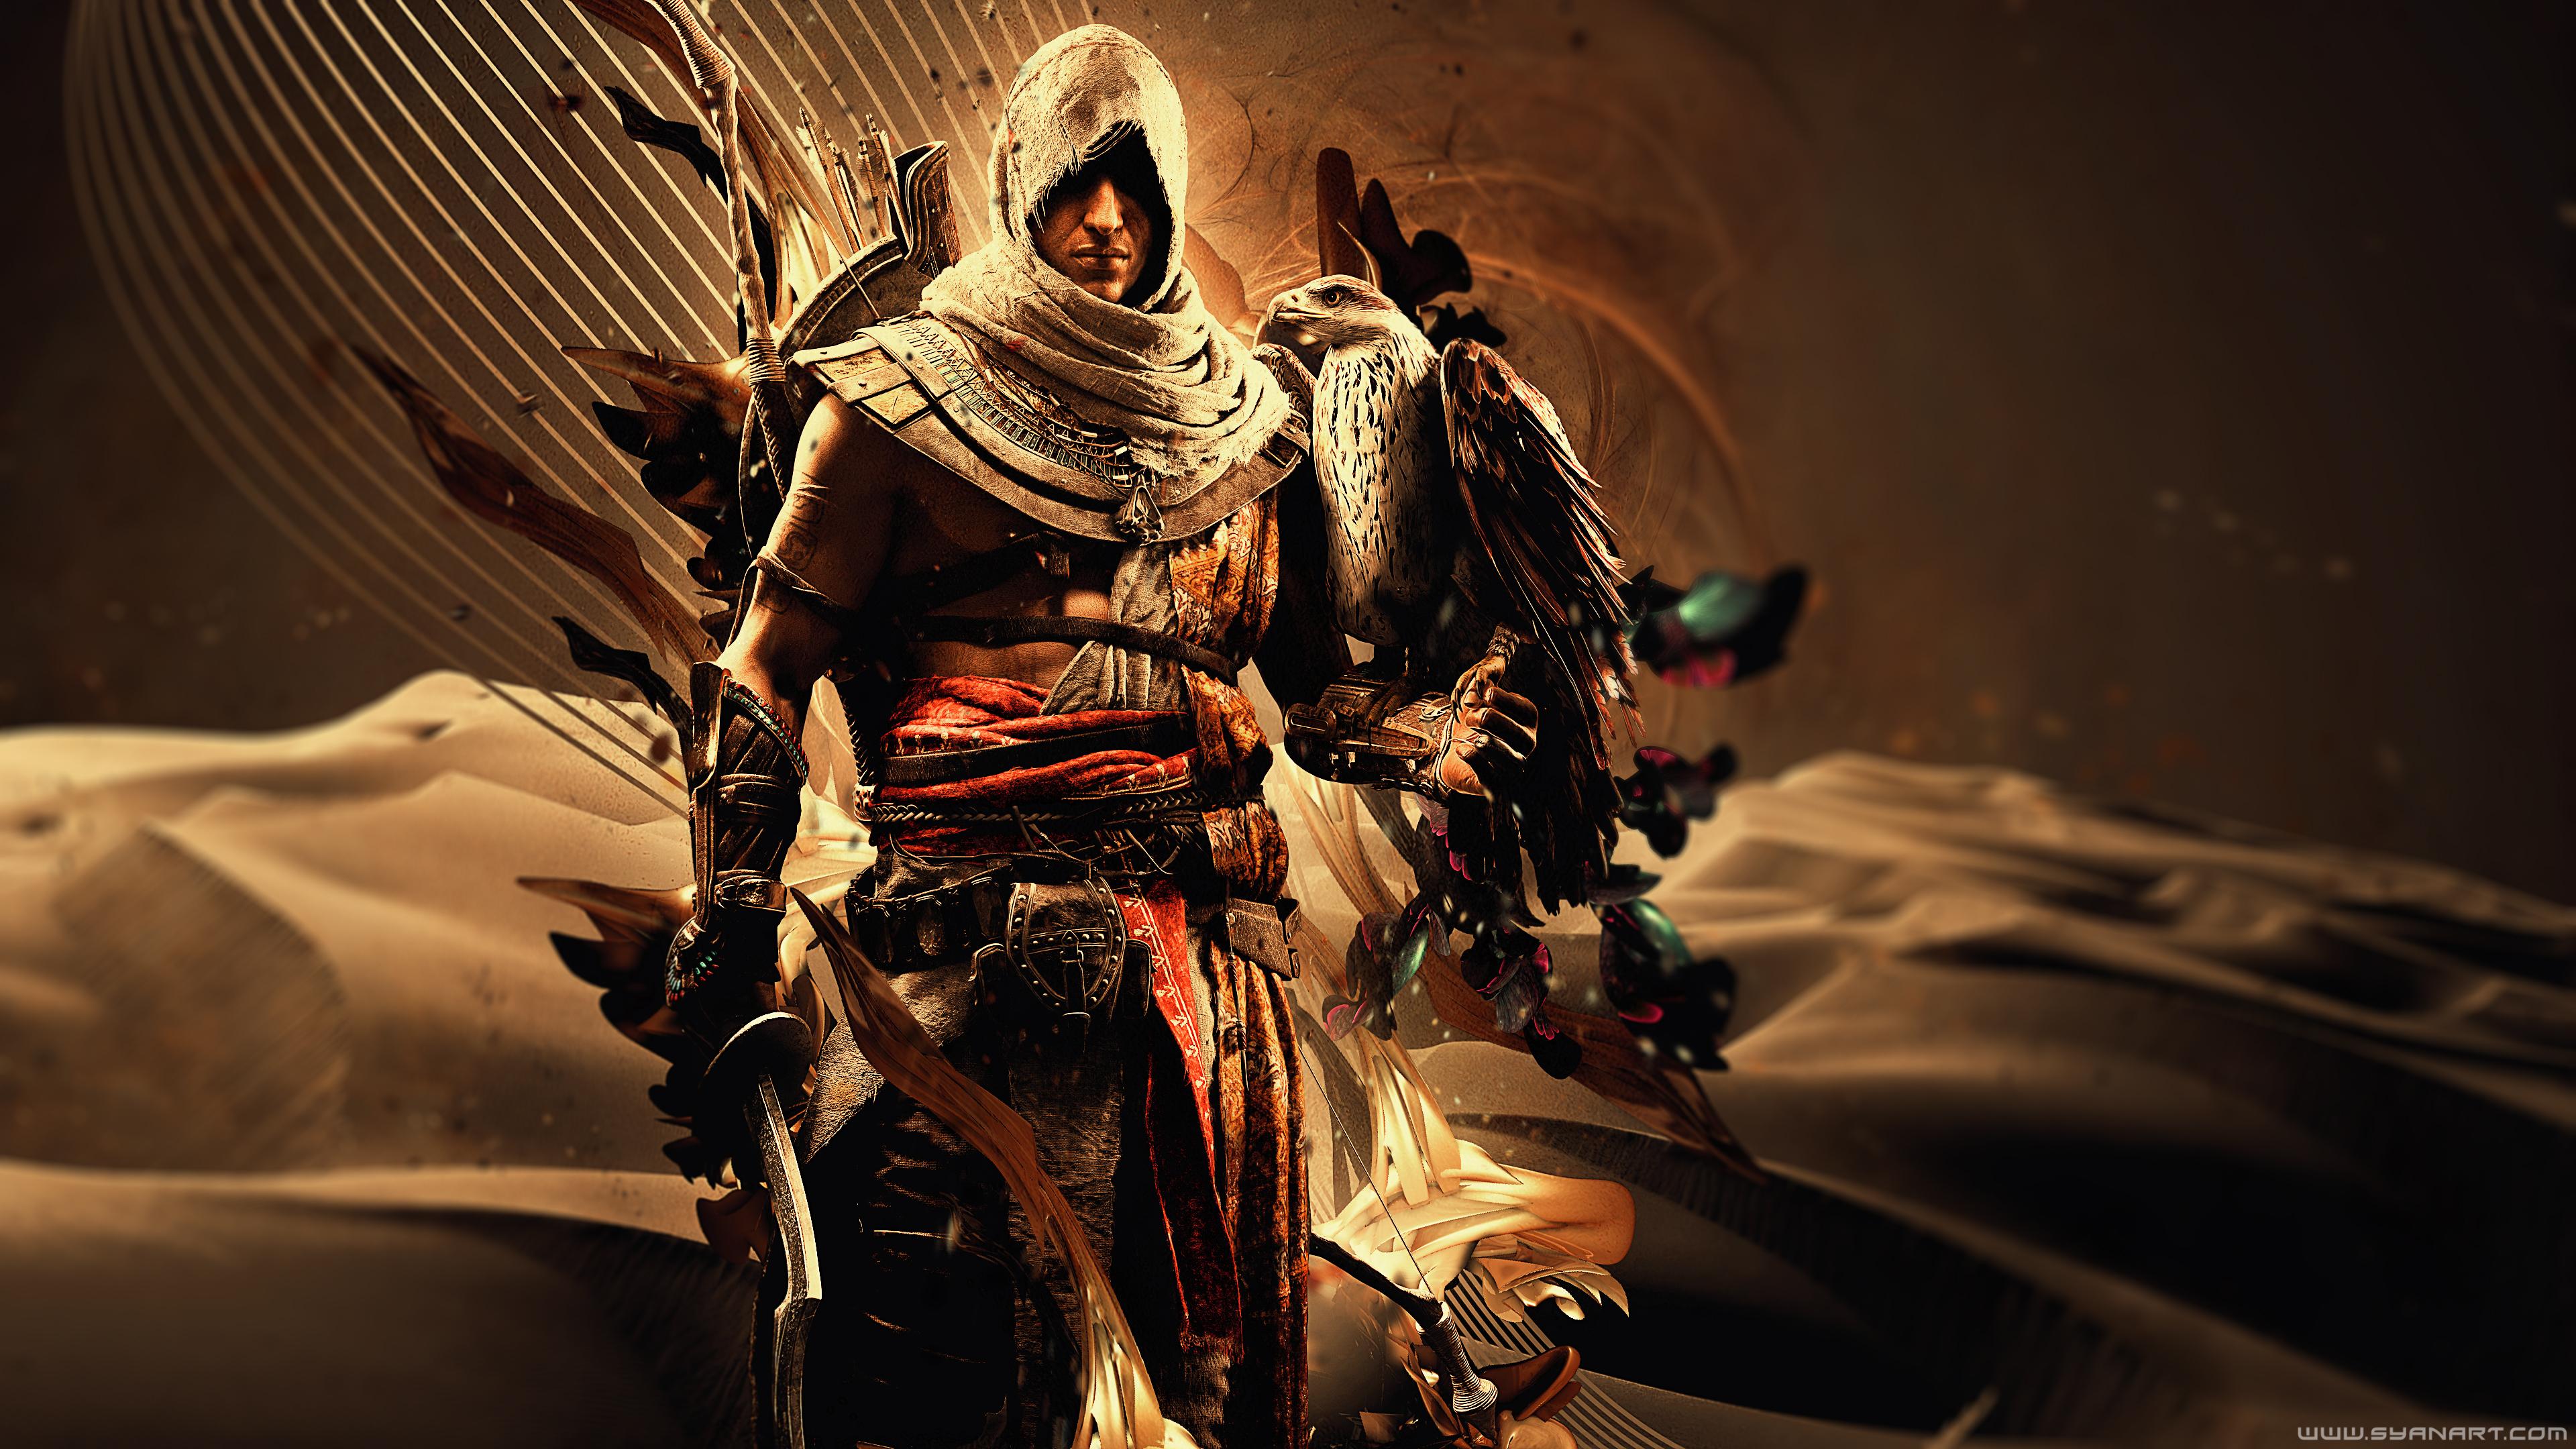 Bayek Of Siwa Assassins Creed Origins 4k Hd Games 4k Wallpapers